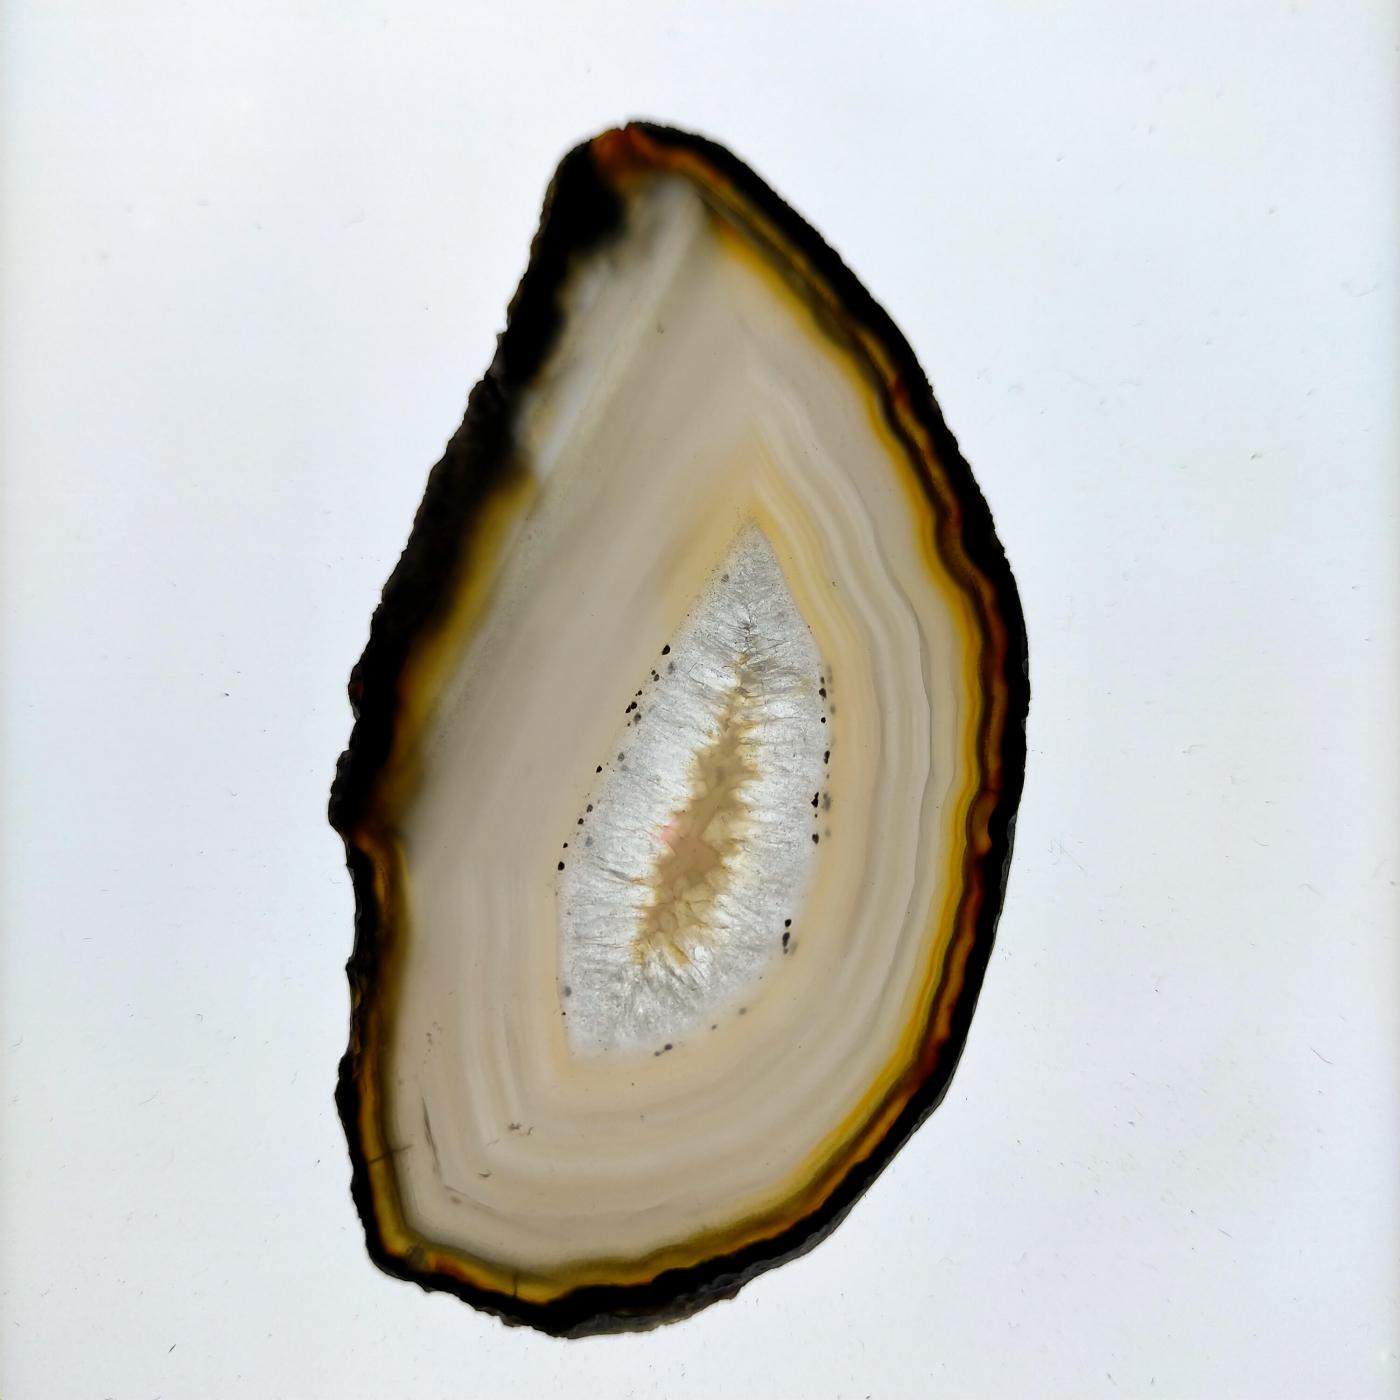 Àgata laminada marrón translúcida -